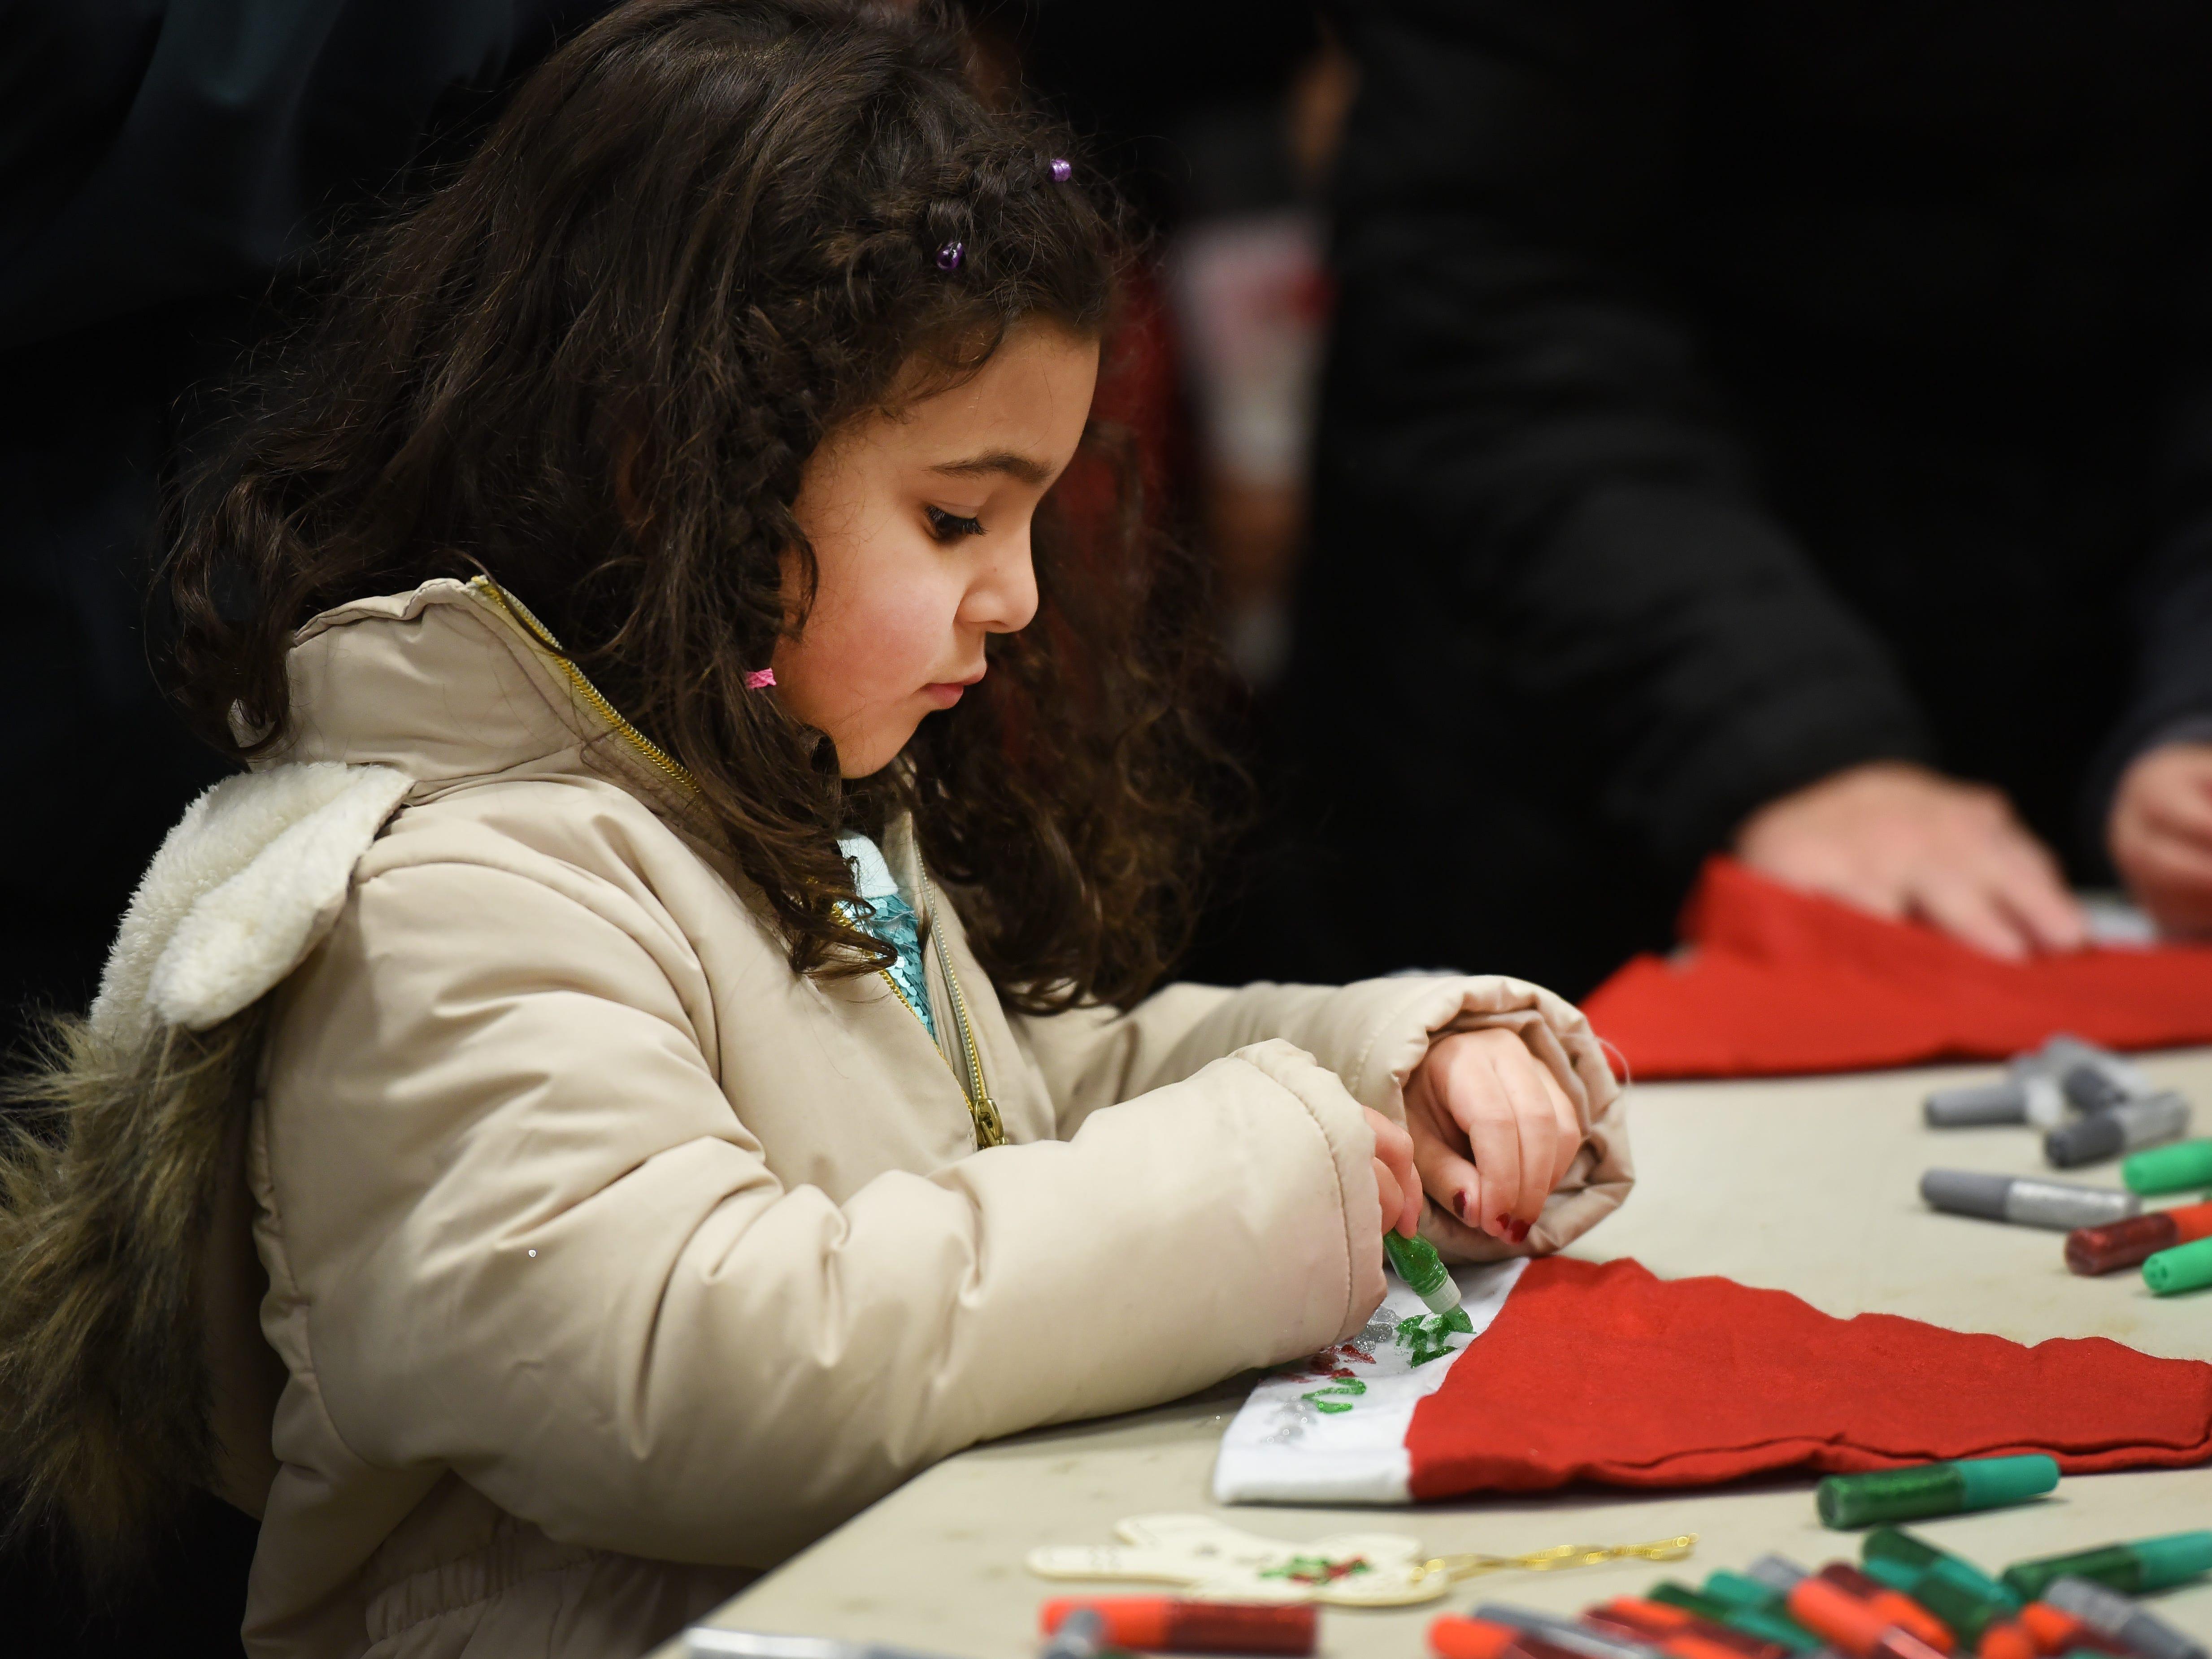 Natalia Dressler (age 5) decorates a Christmas cap prior to the Christmas Tree Lighting ceremony at Cedar Grove Town Hall on 12/03/18.